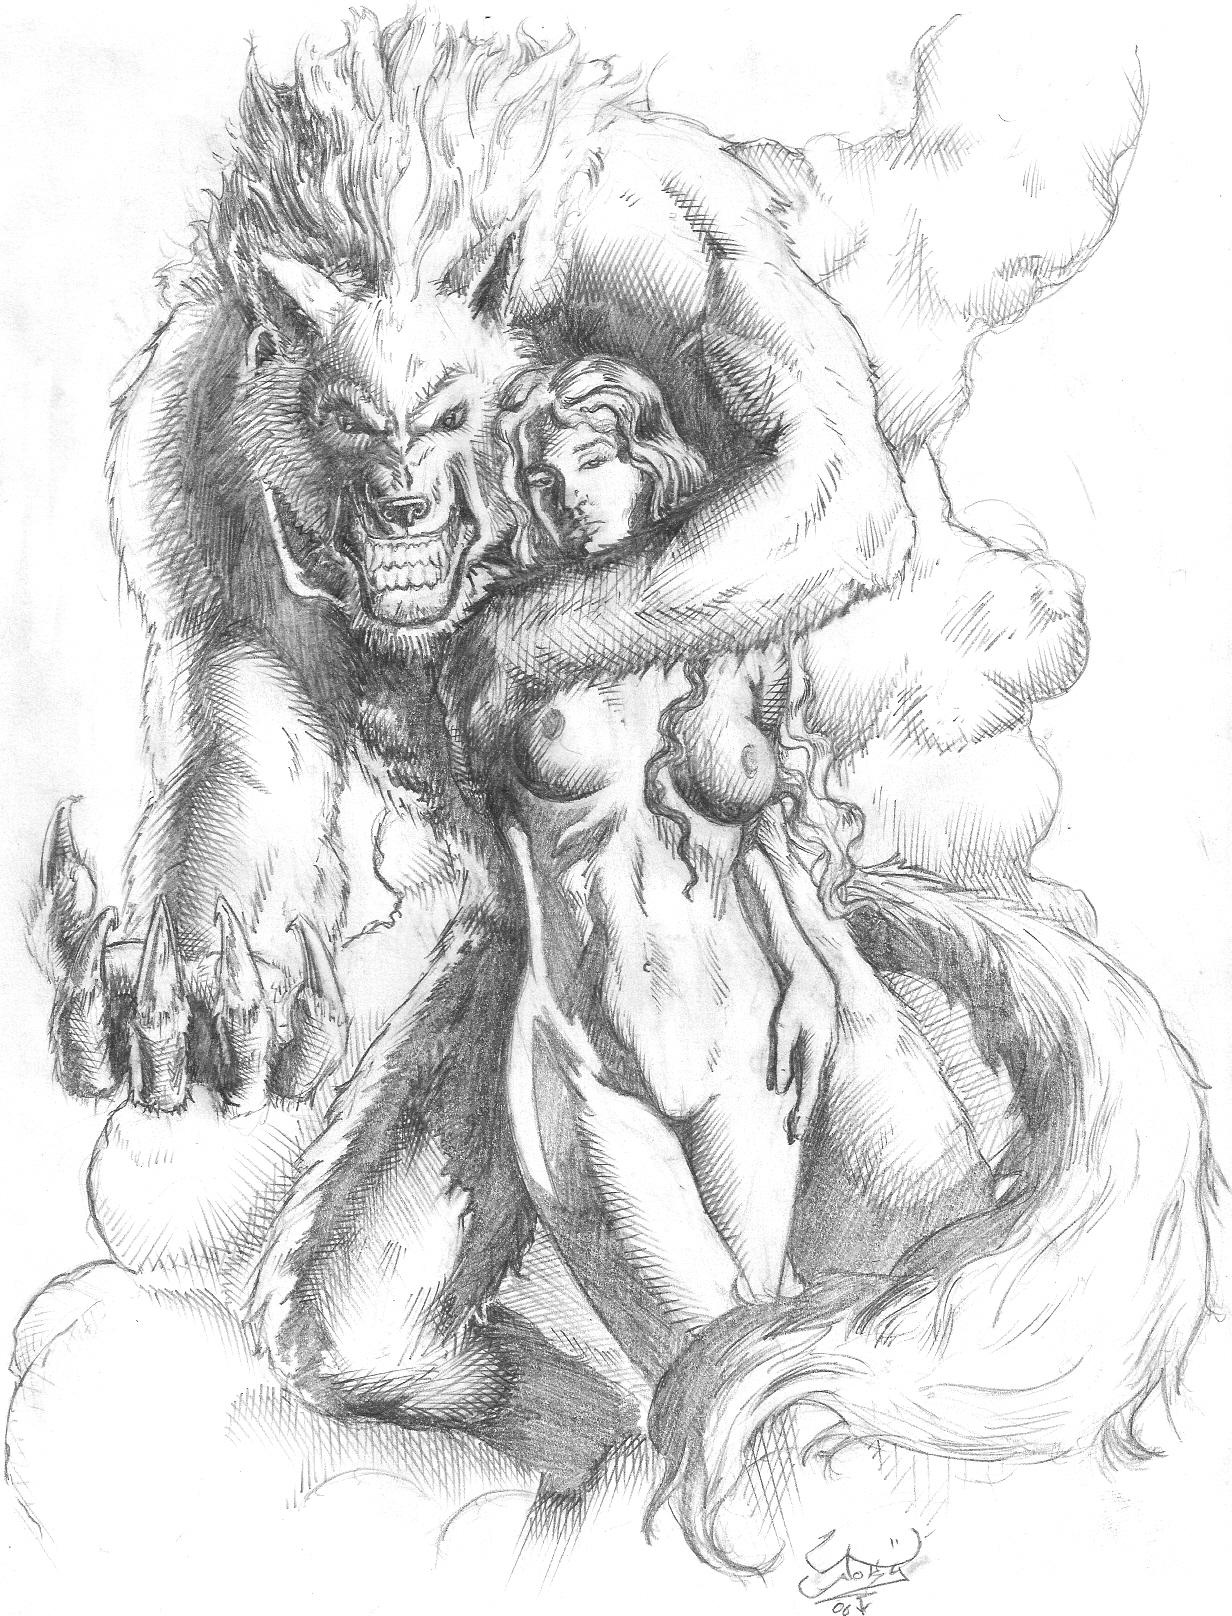 Drawn wolfman female werewolf JokY wolfwoman on Explore DeviantArt